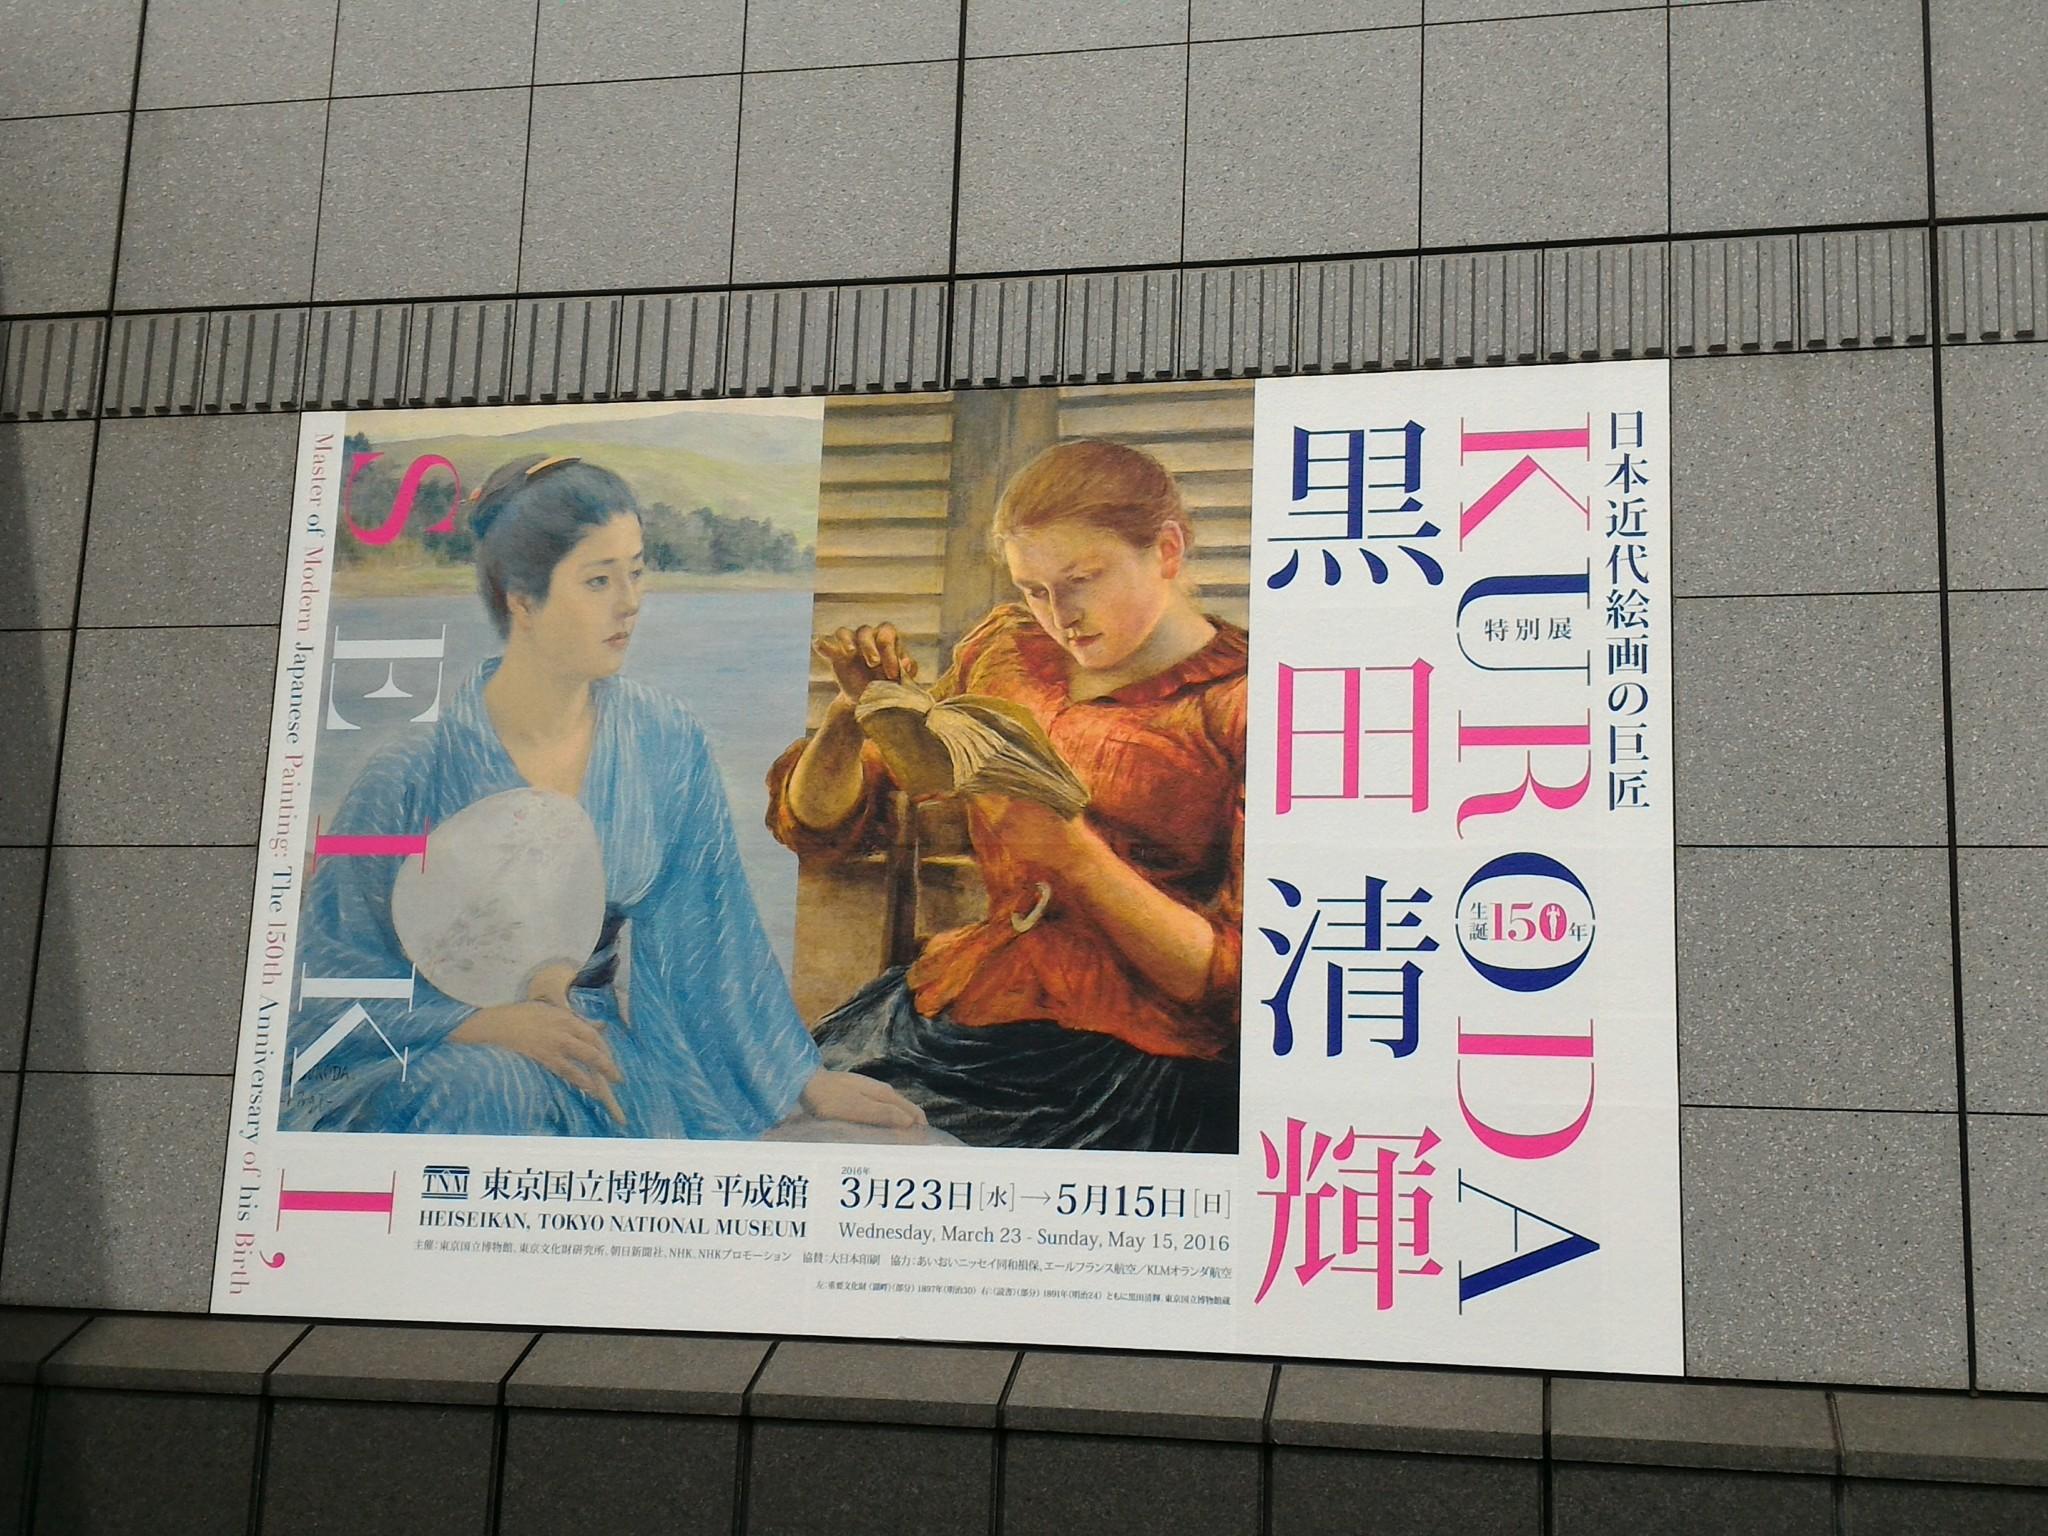 生誕150年 黒田清輝ー日本近代絵画の巨匠